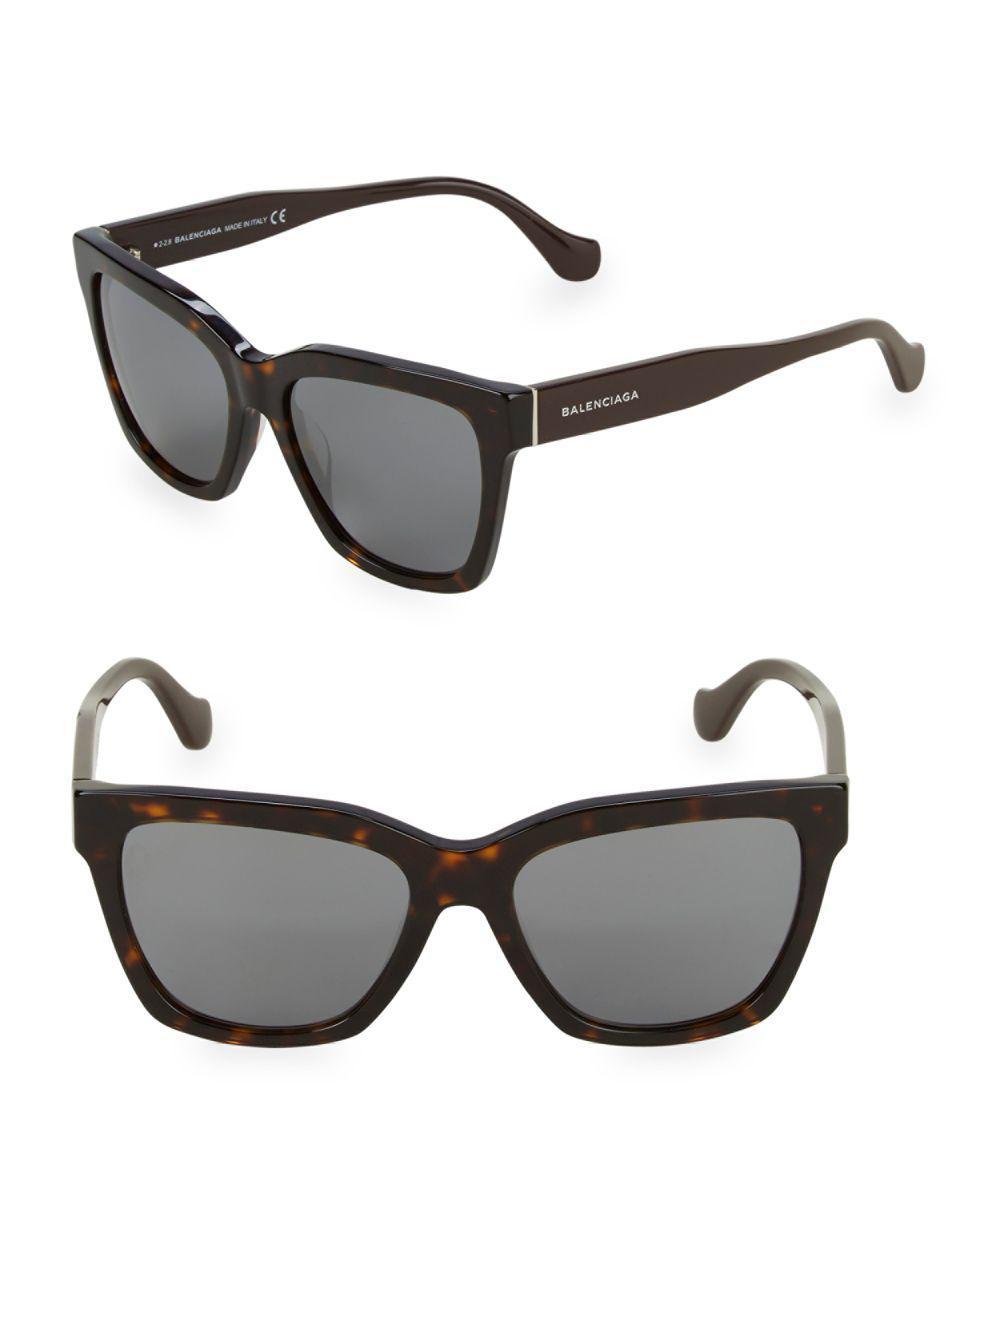 13ec5f5441e Balenciaga - Brown Tortoiseshell 55mm Square Sunglasses - Lyst. View  fullscreen